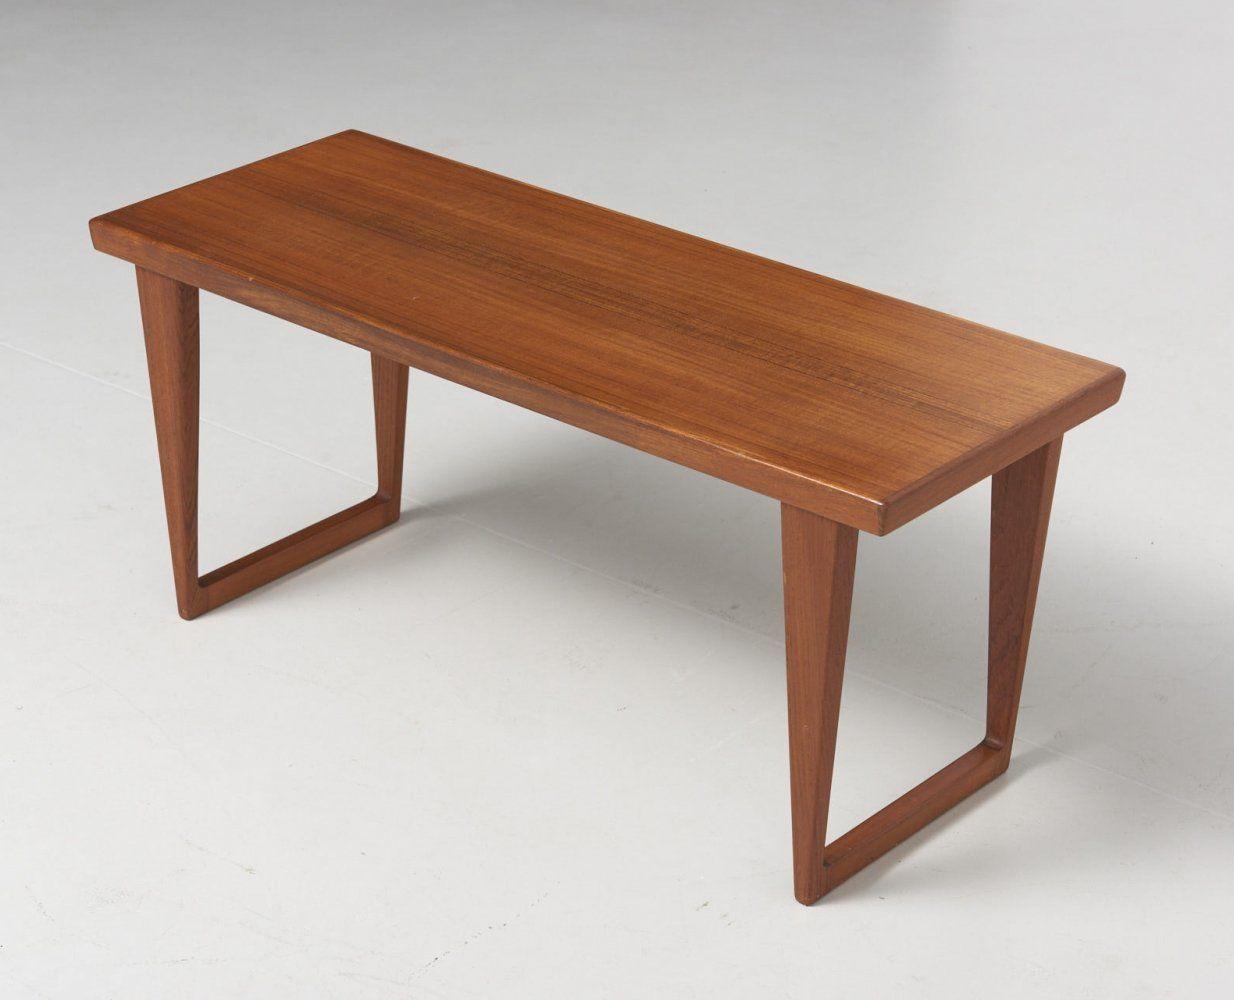 For Sale Model N 35 Side Table In Teak By Kai Kristiansen In 2020 Teak Side Table Kai Kristiansen